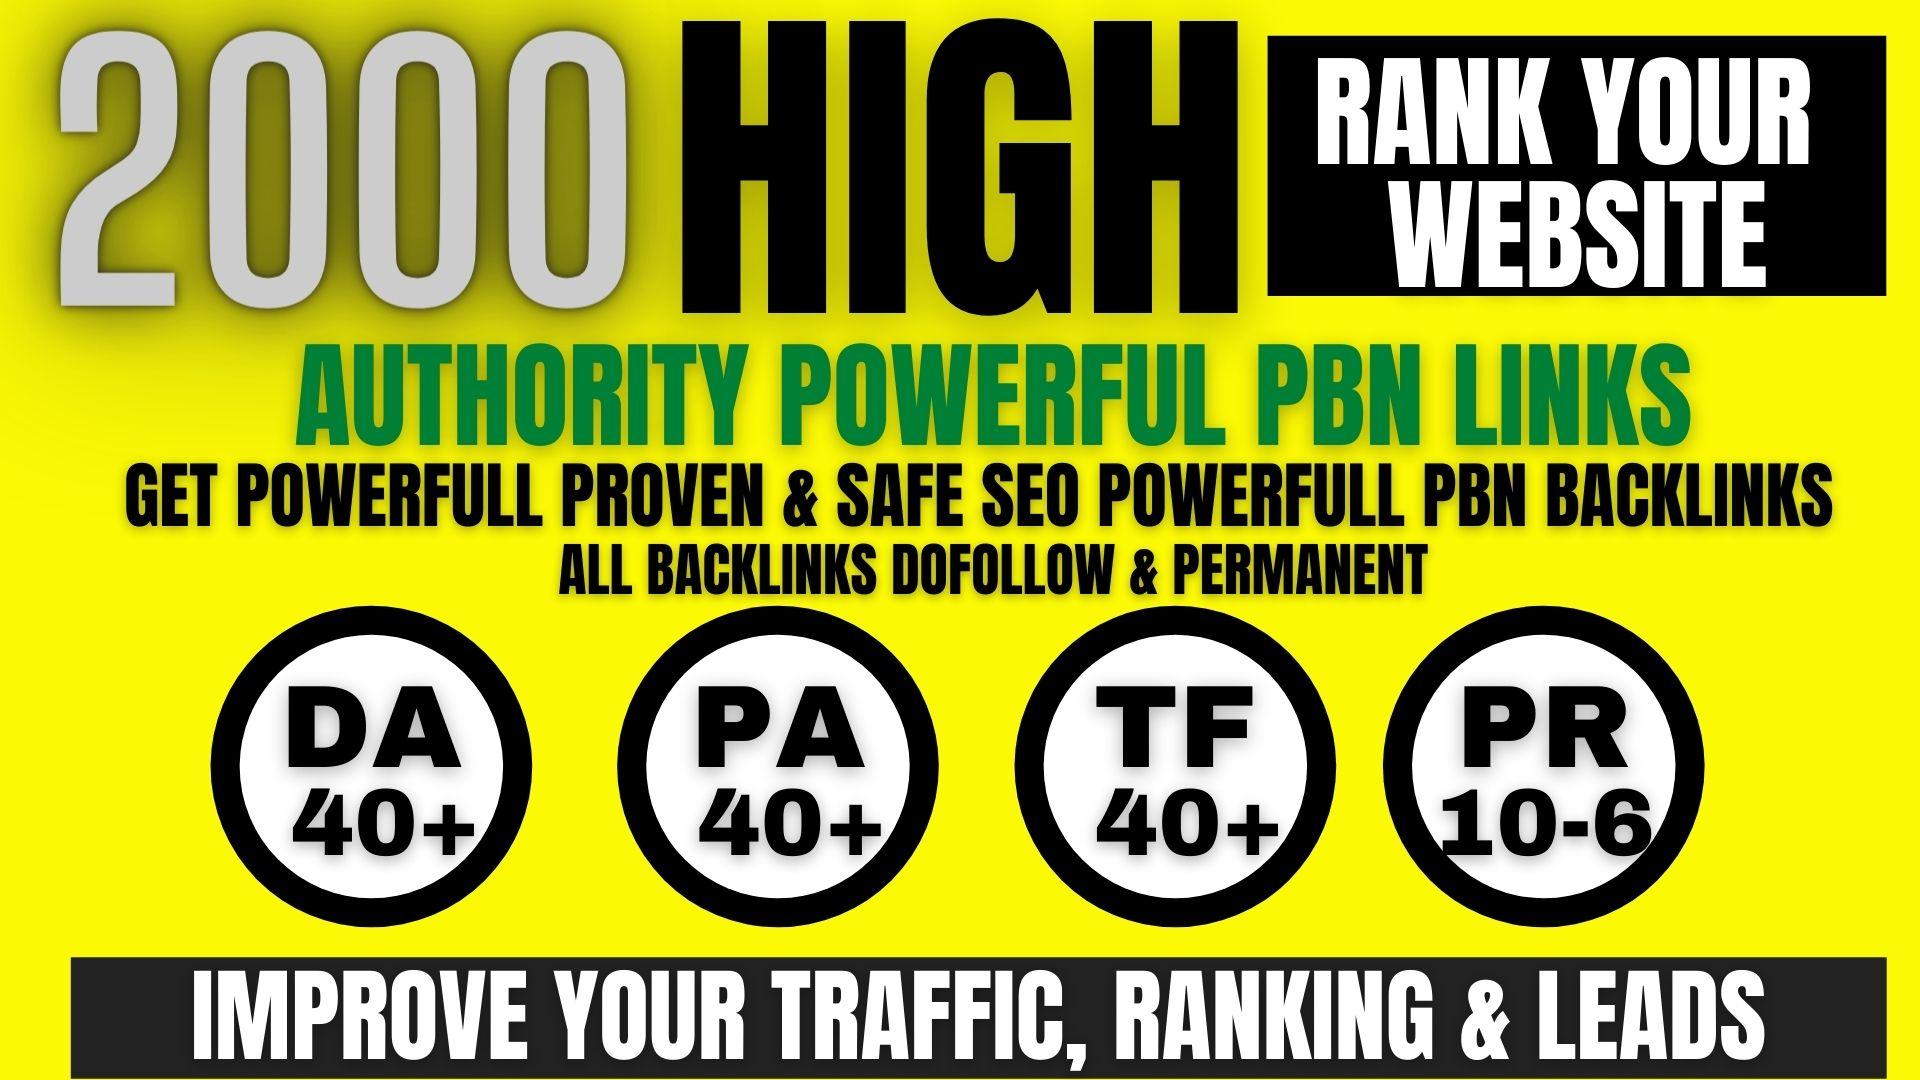 get premium permanent 2000 Pbn Backlink DA40+PA40+PR10 to 6 dofollow unique site